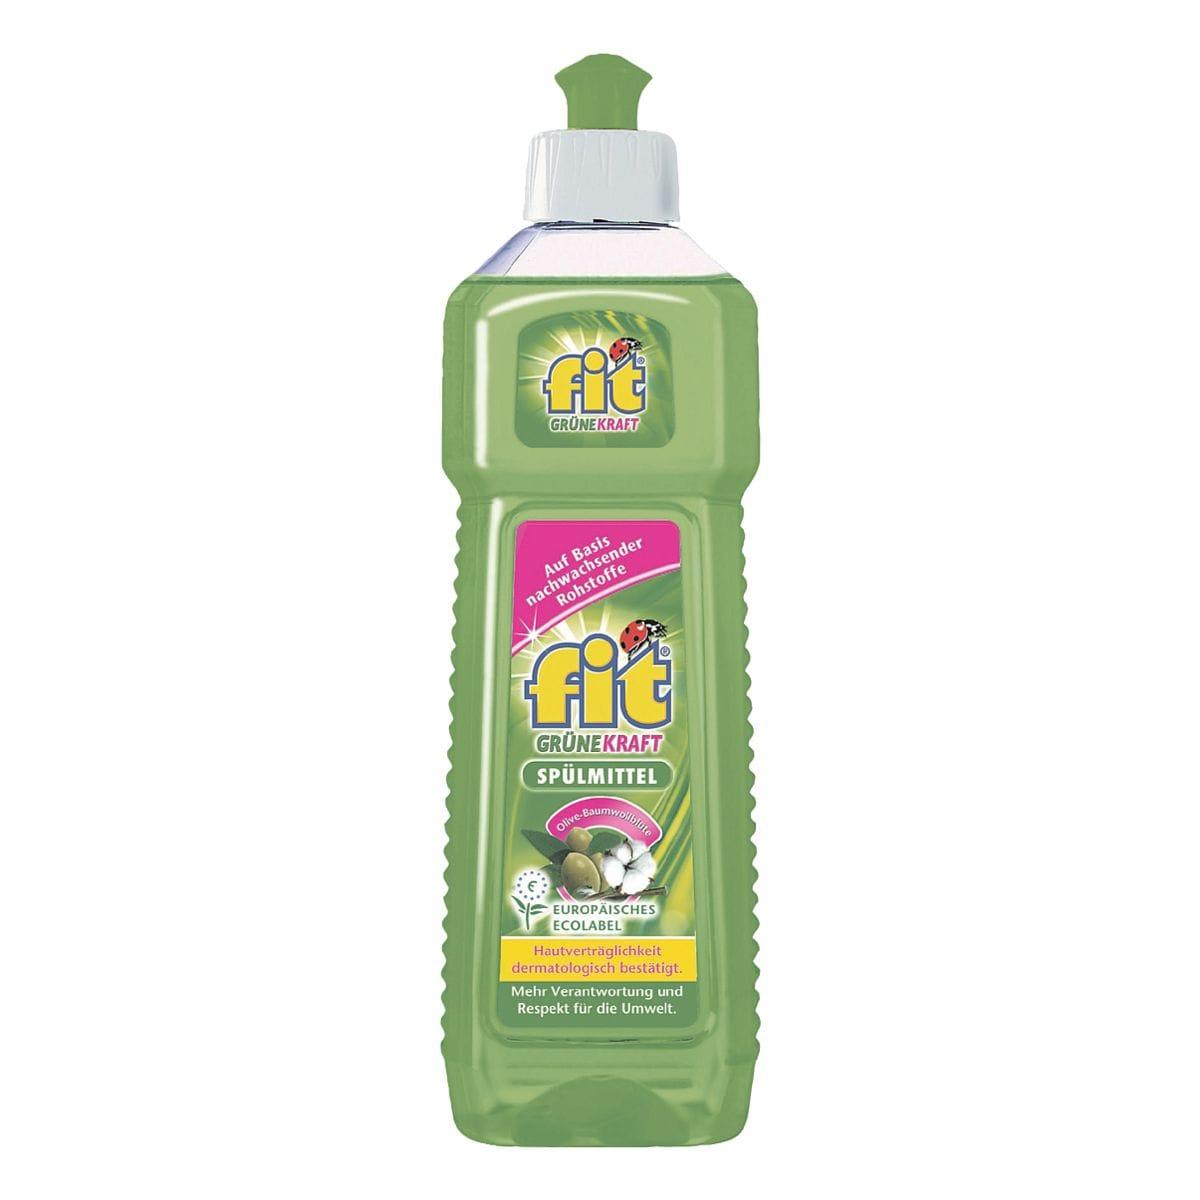 fit GRÜNEKRAFT Geschirrspülmittel »fit Grüne Kraft«